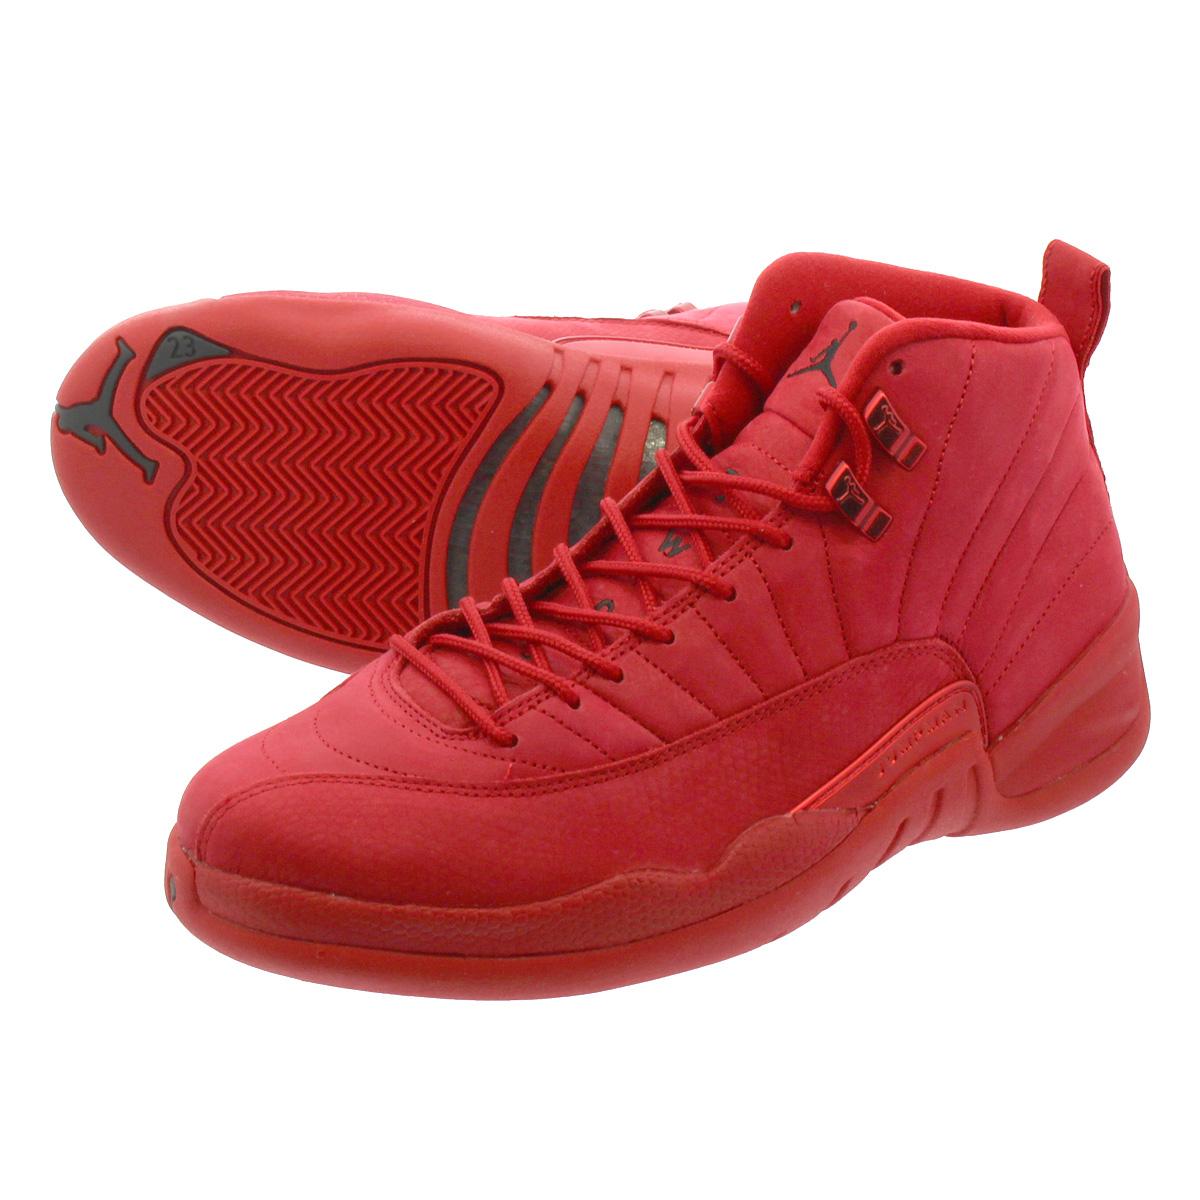 423eca6f8d8b4c LOWTEX PLUS  NIKE AIR JORDAN 12 RETRO Nike Air Jordan 12 nostalgic GYM RED BLACK  130